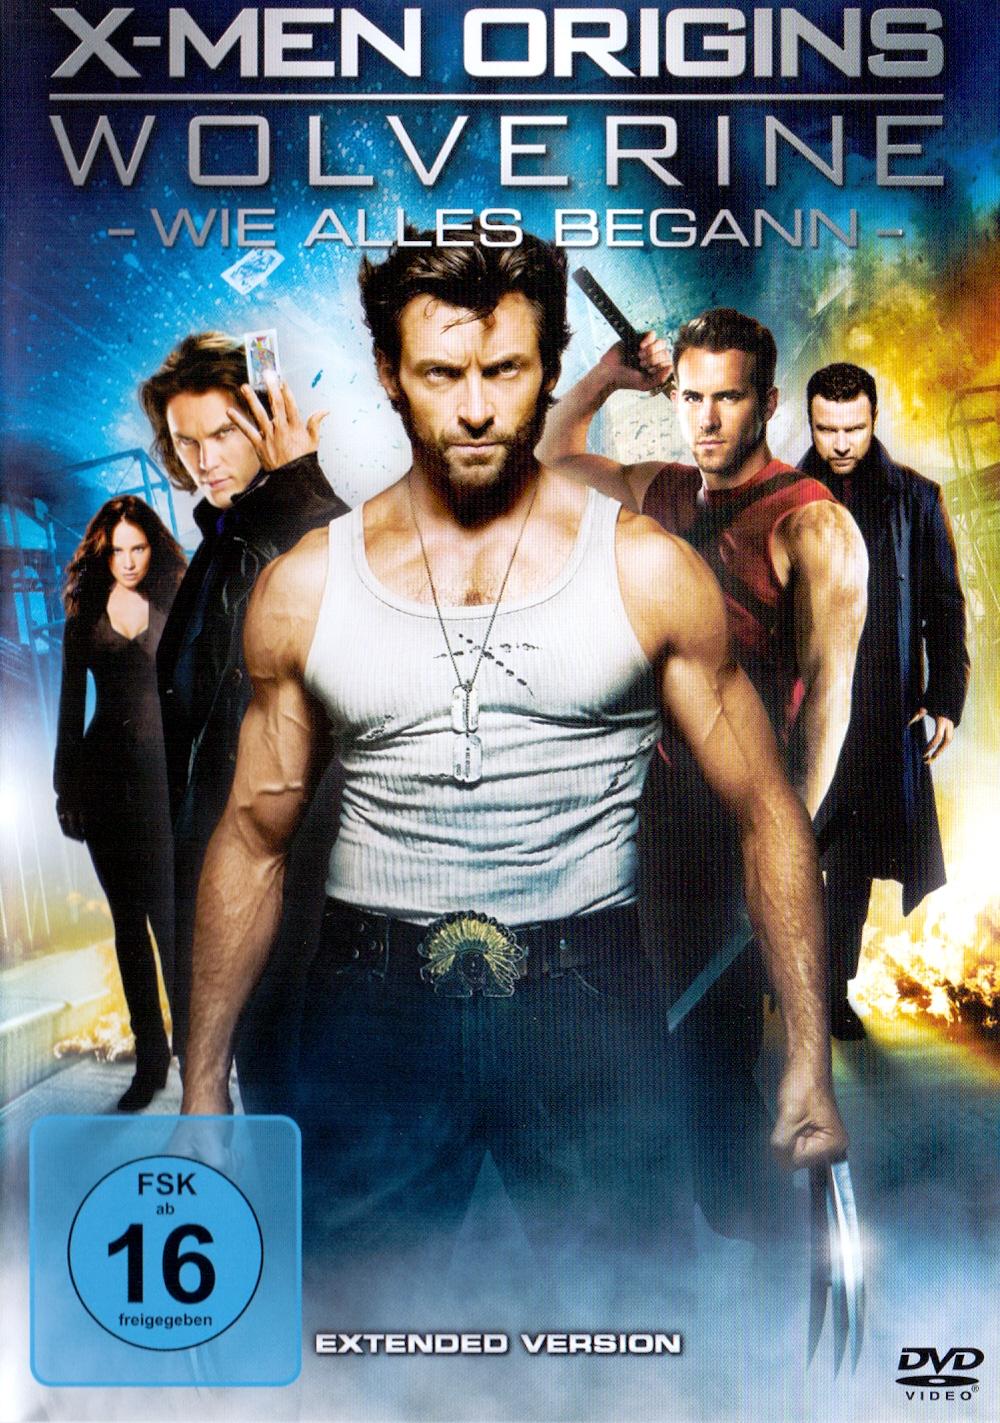 X-Men Origins: Wolverine [Extended Version]